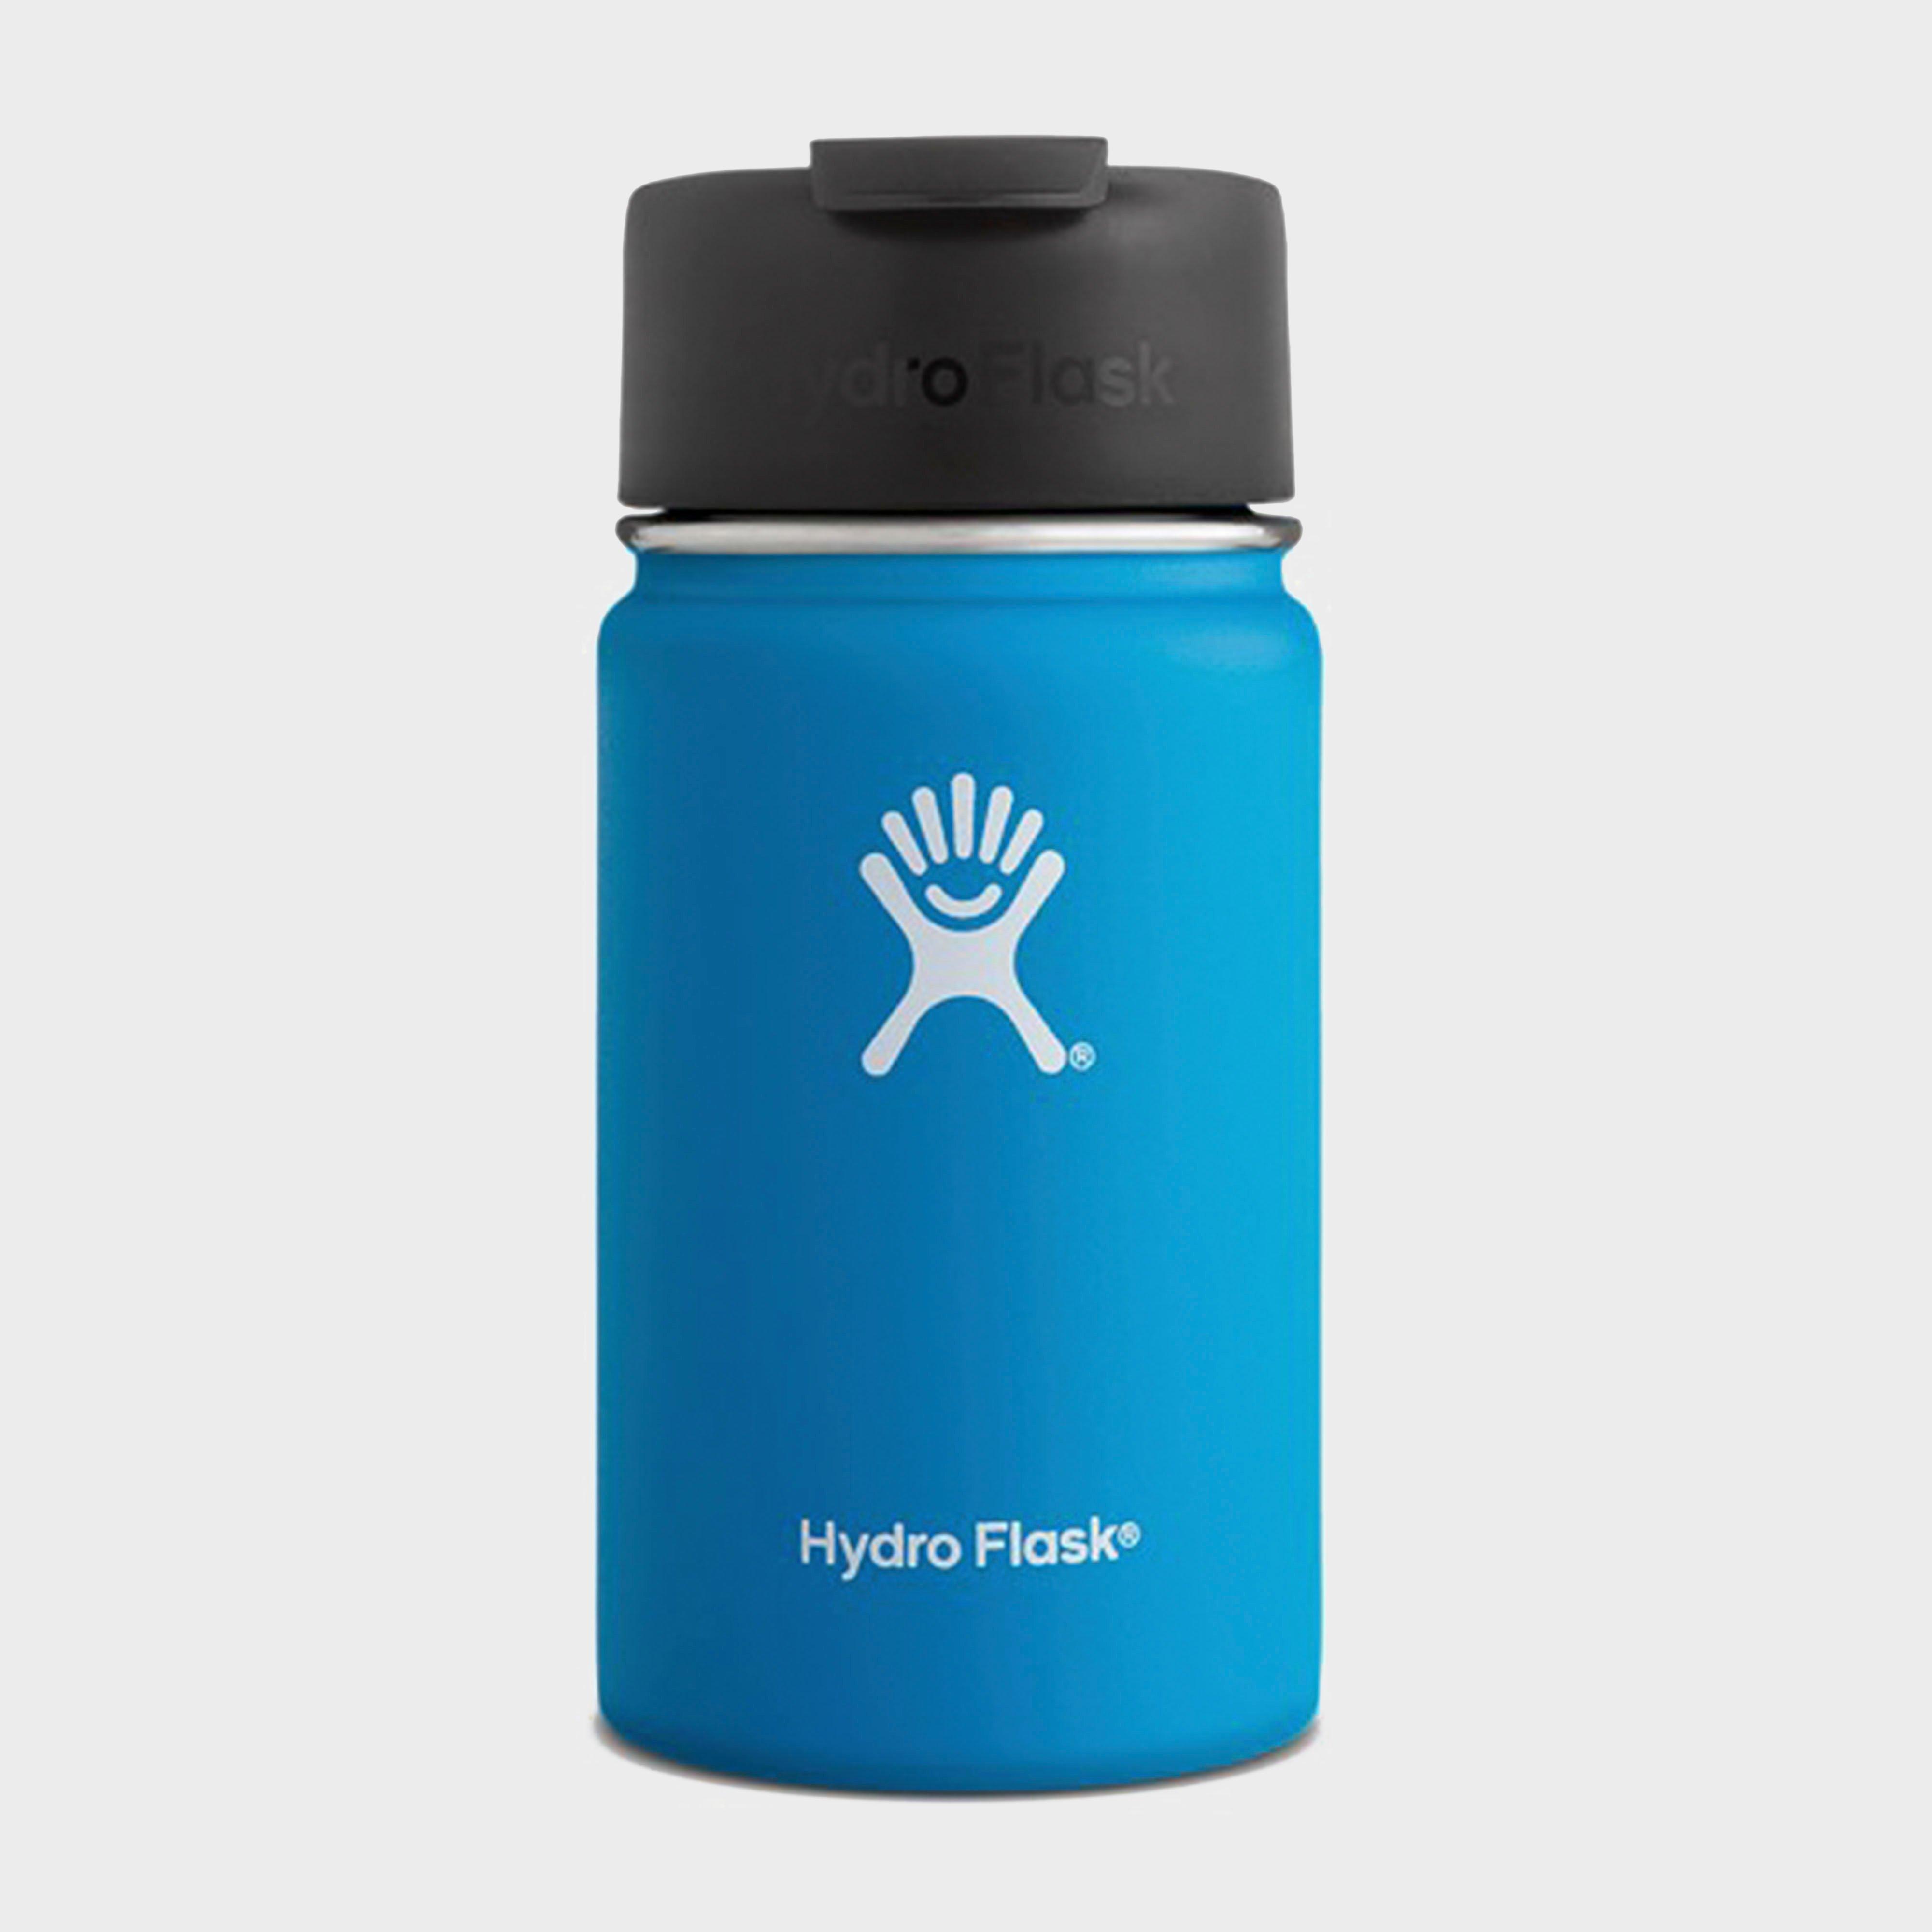 Hydro Flask Hydro Flask 12oz Wide Mouth Coffee Flask - Blue, Blue